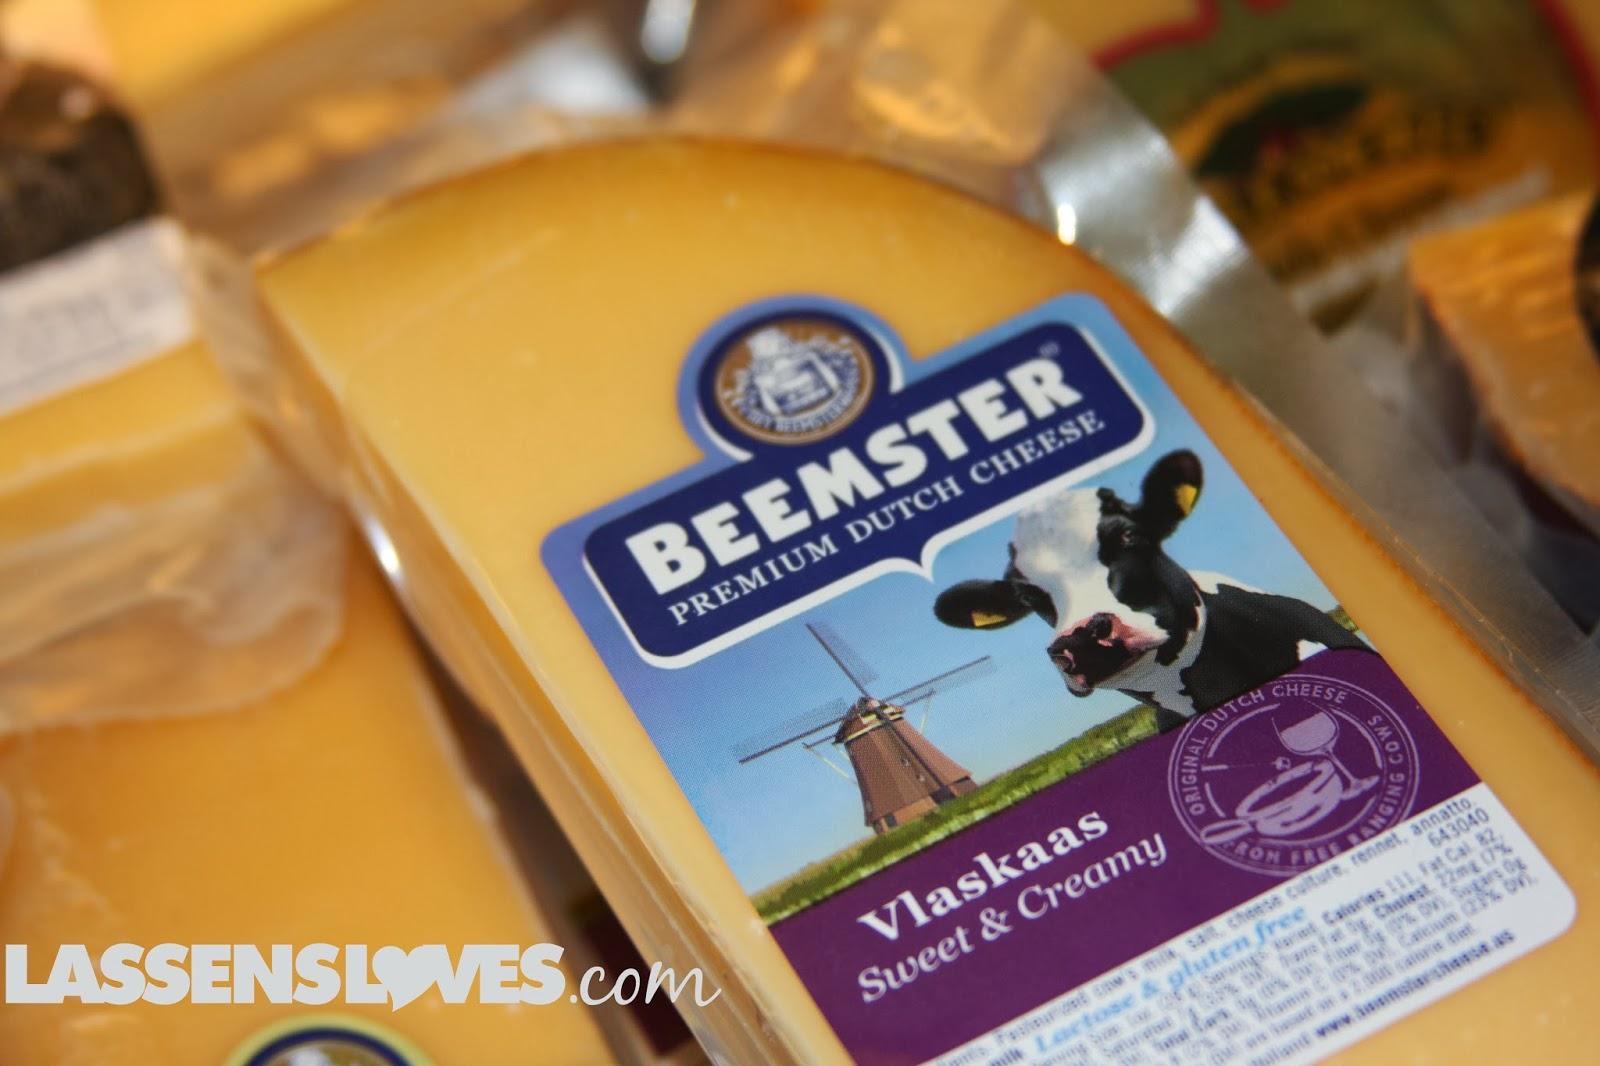 Beemster+Gouda+Cheese, Beemster+Cheese, Gouda+Cheese